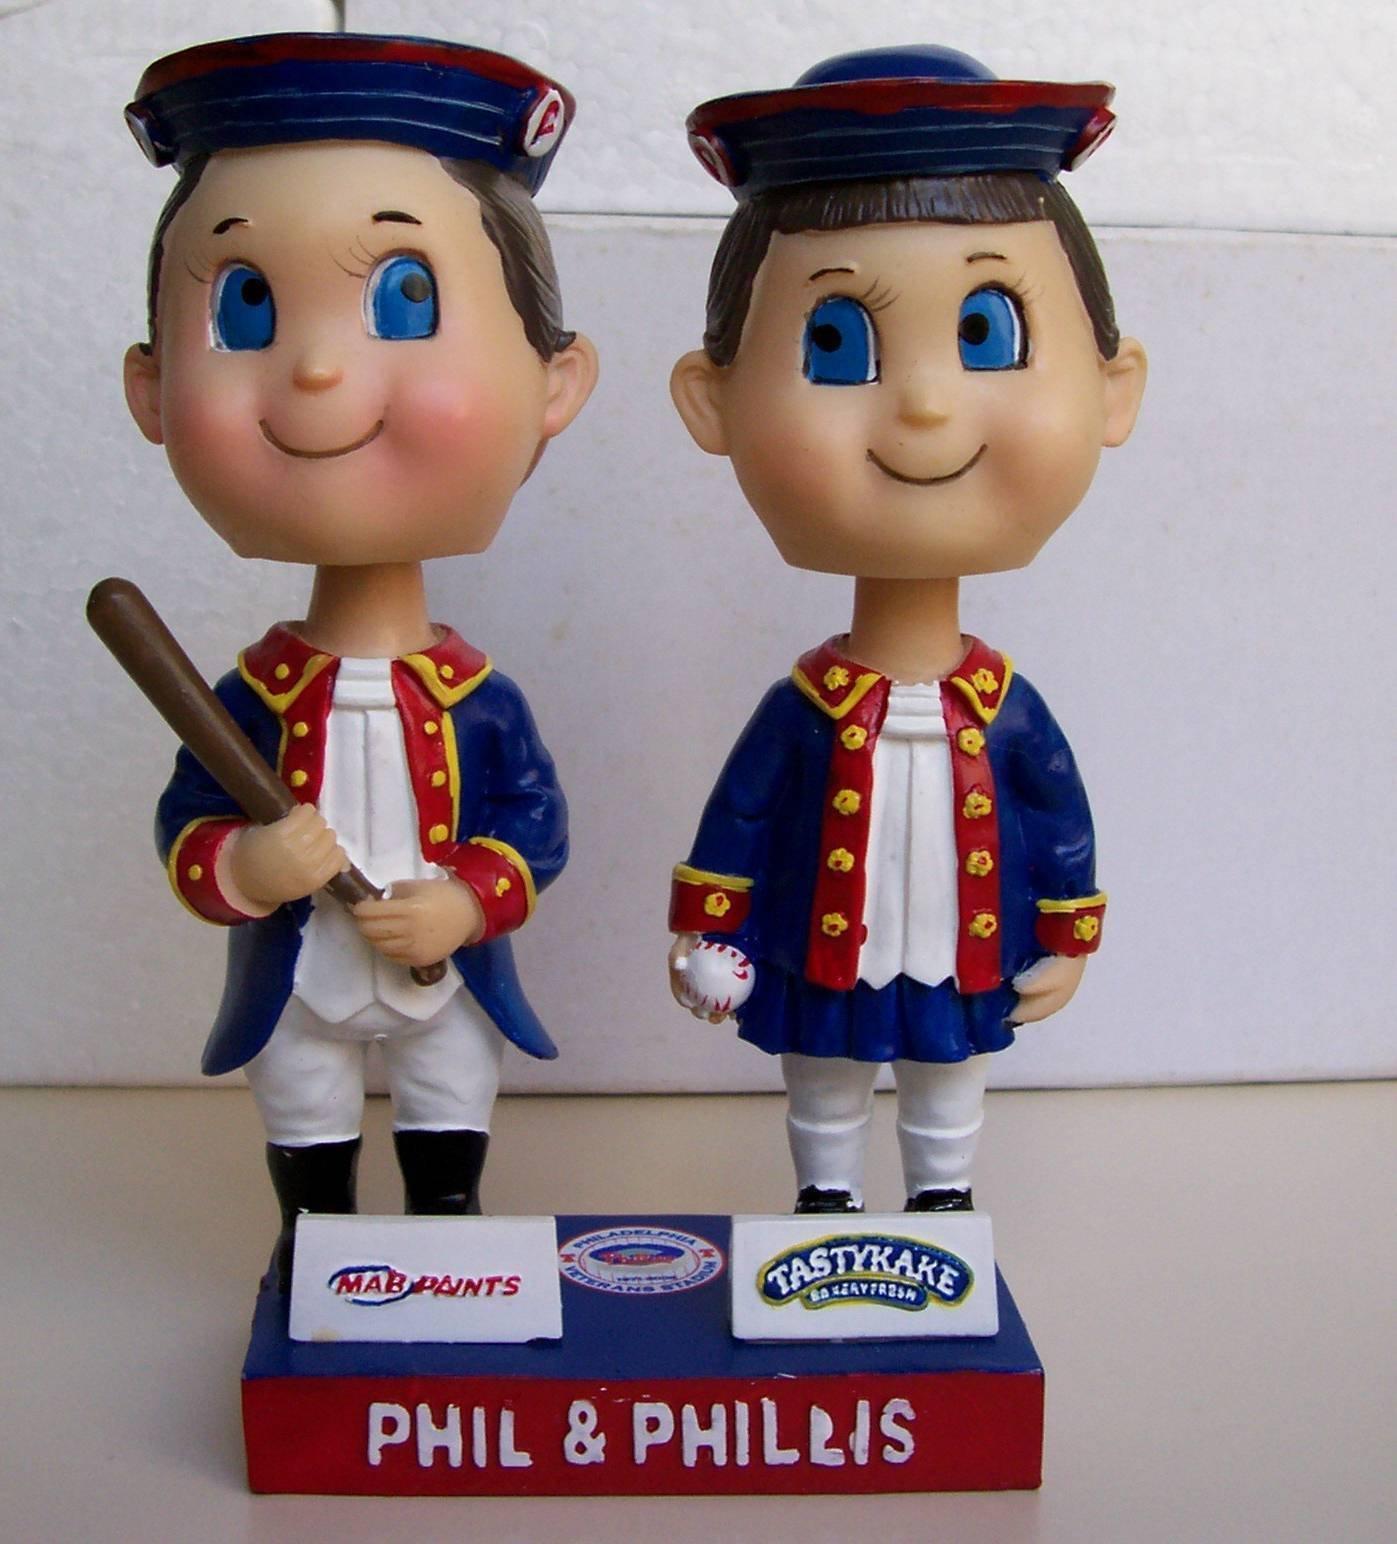 2003 PHILADELPHIA PHIL PHILLIS DUAL BOBBLEHEAD VETERANS STADIUM SGA LOOKS MINT